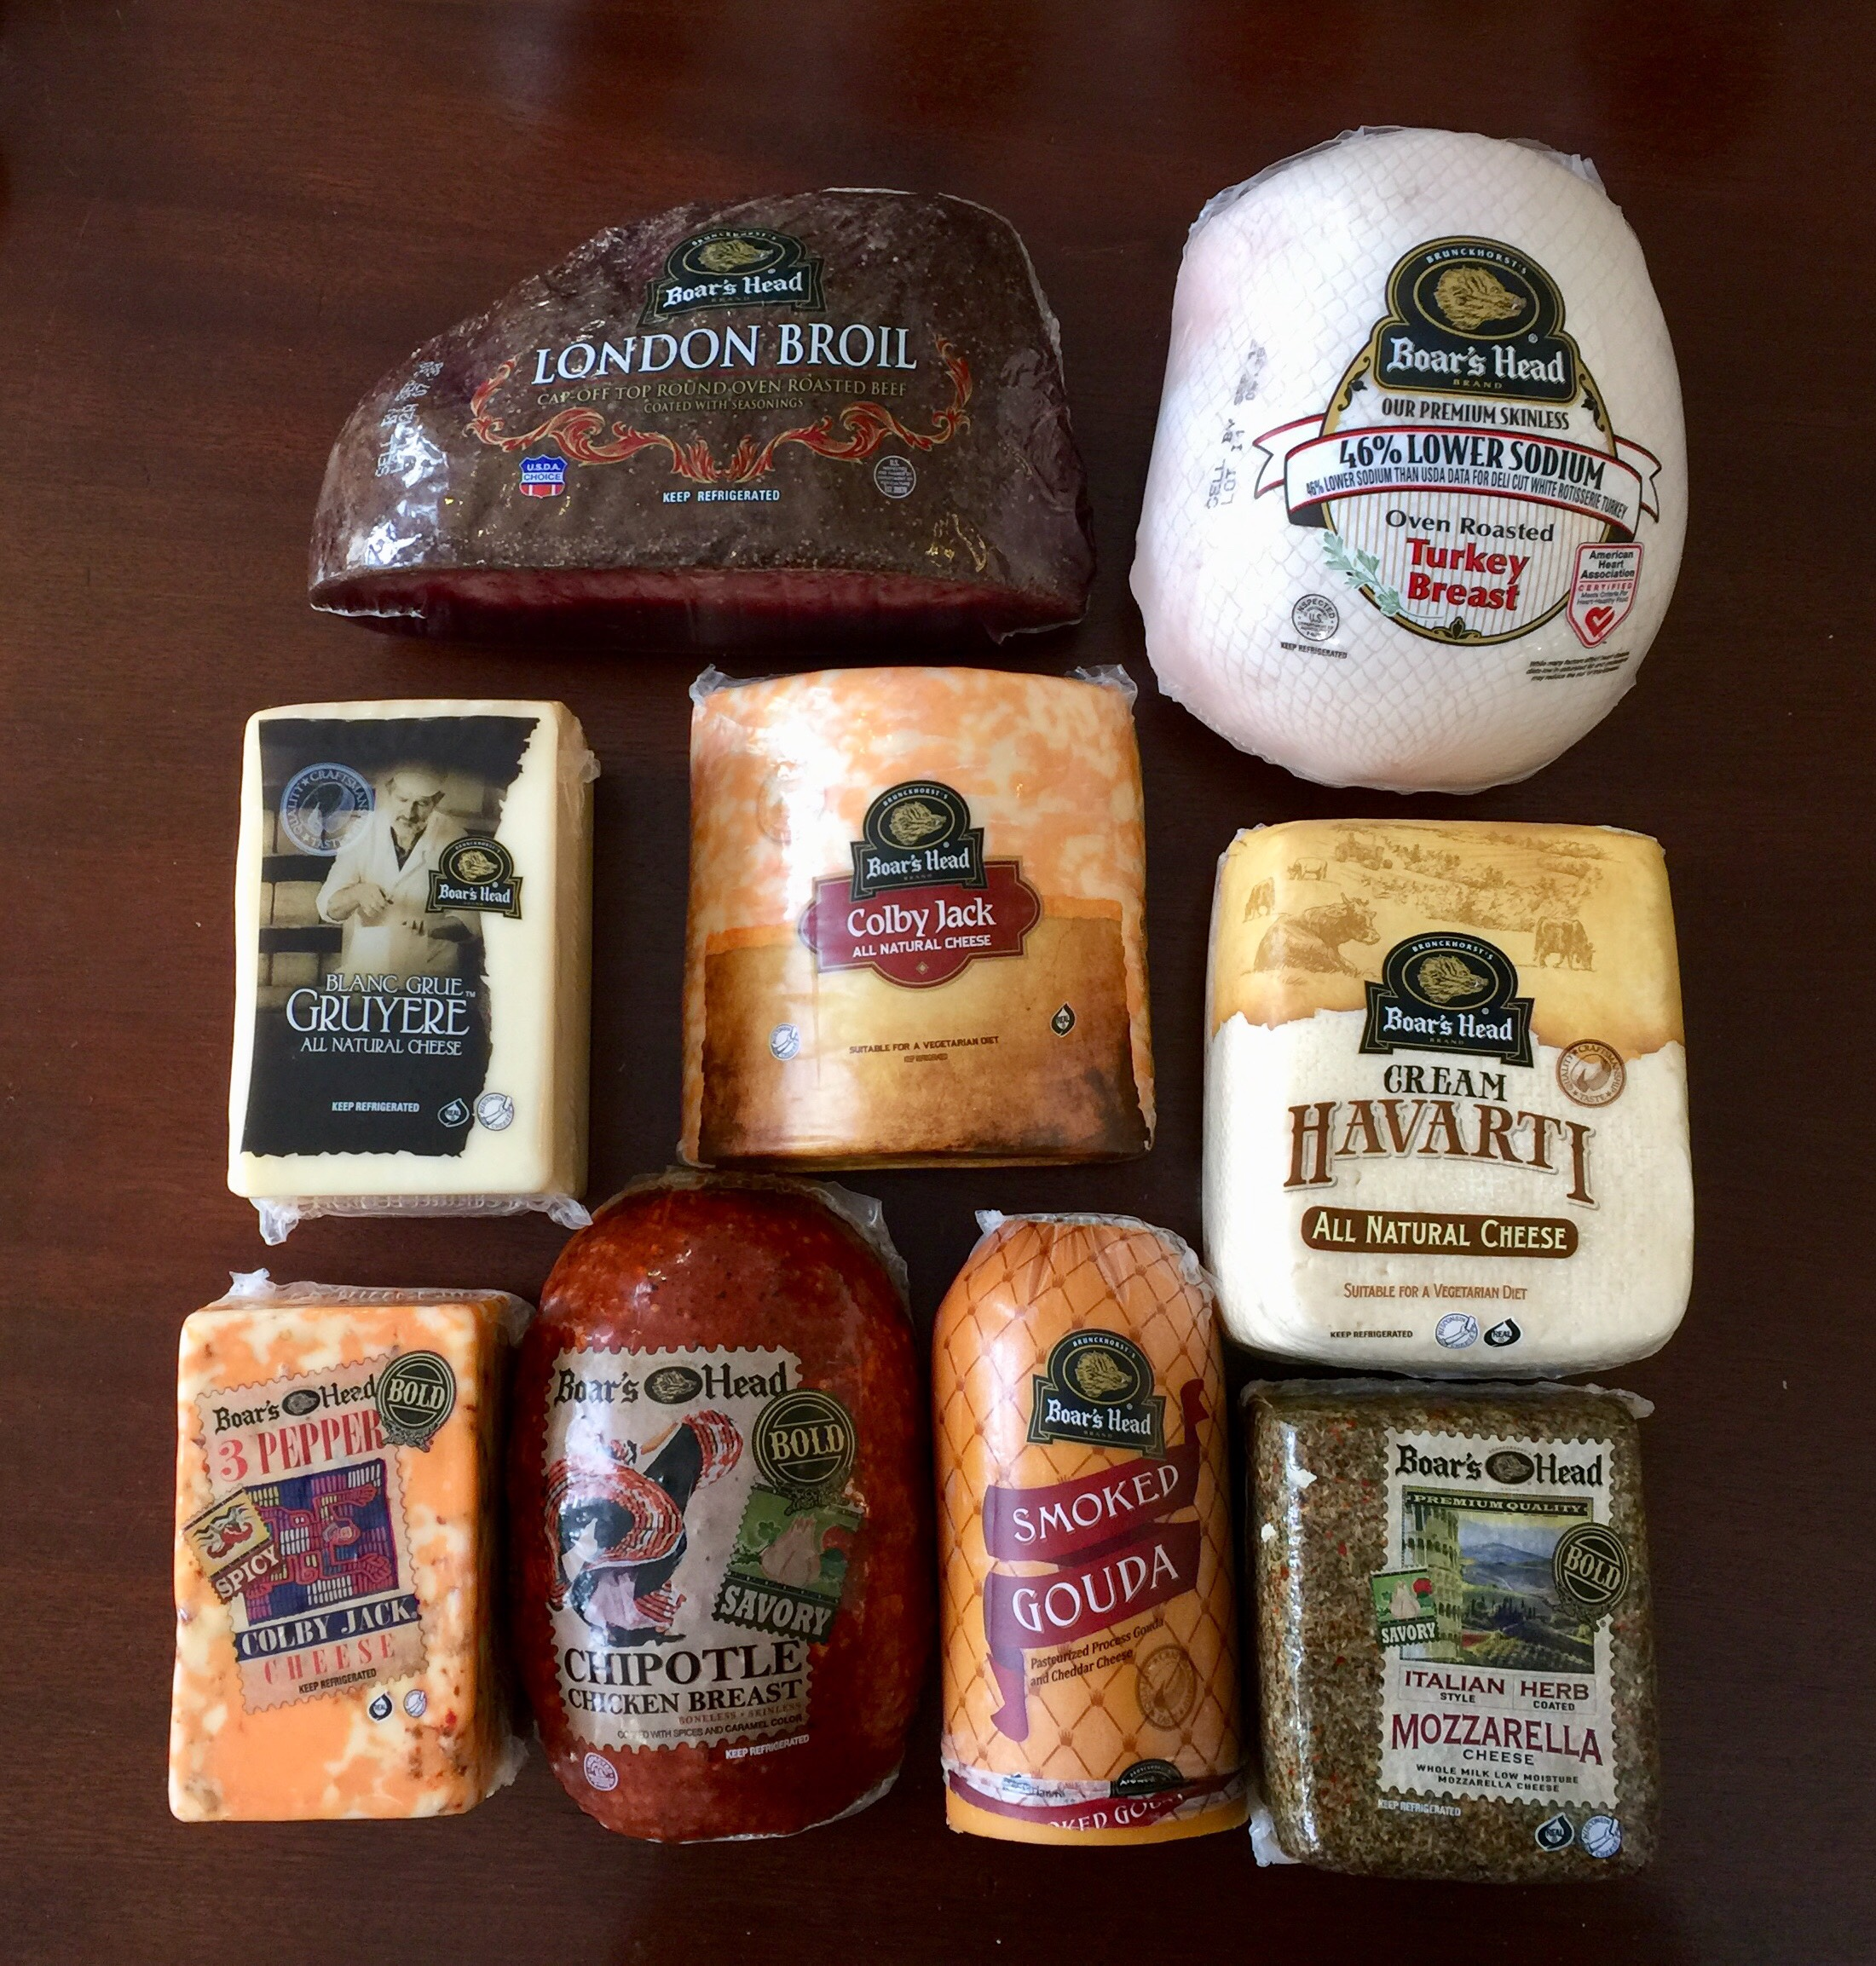 boar's head meats and cheeses - urban deli